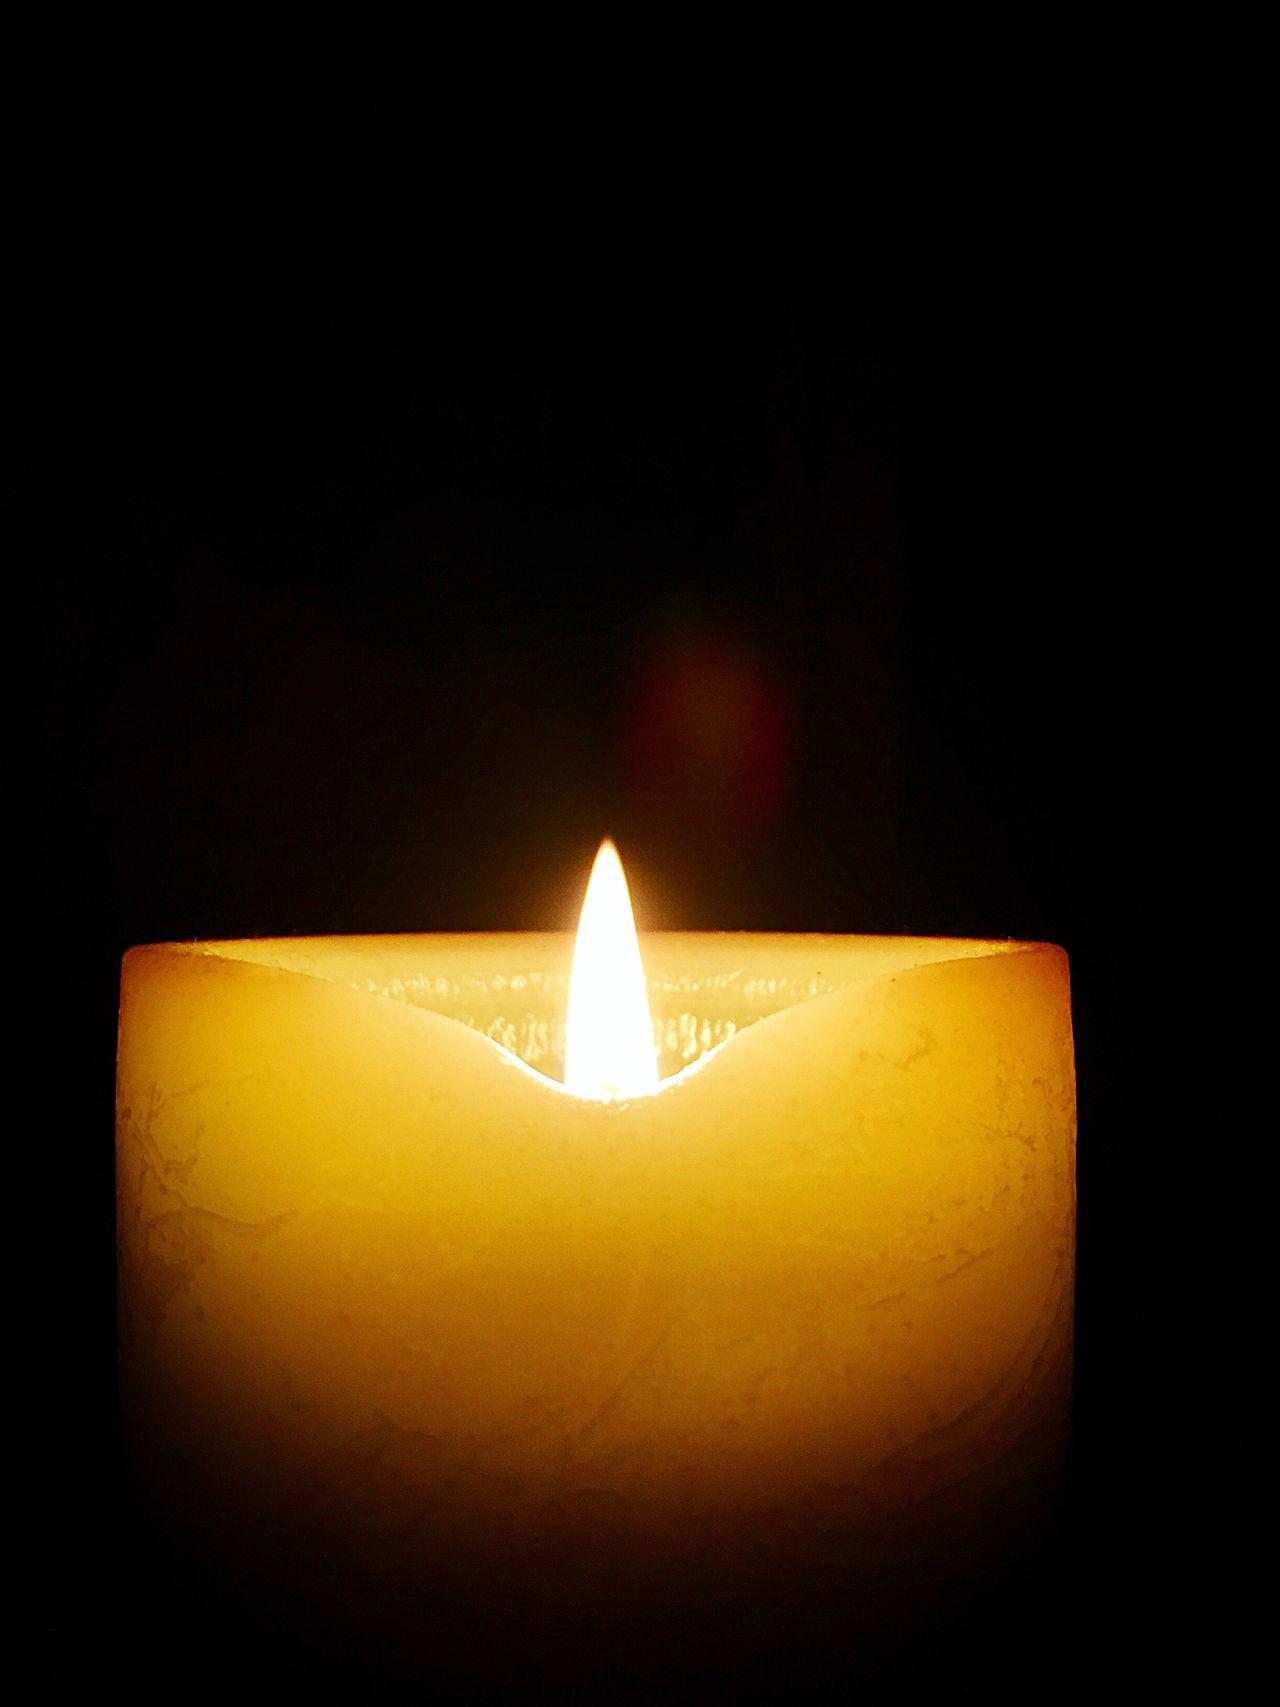 Burning Flame Heat - Temperature Close-up Illuminated Lighting Equipment Dark Black Background Night